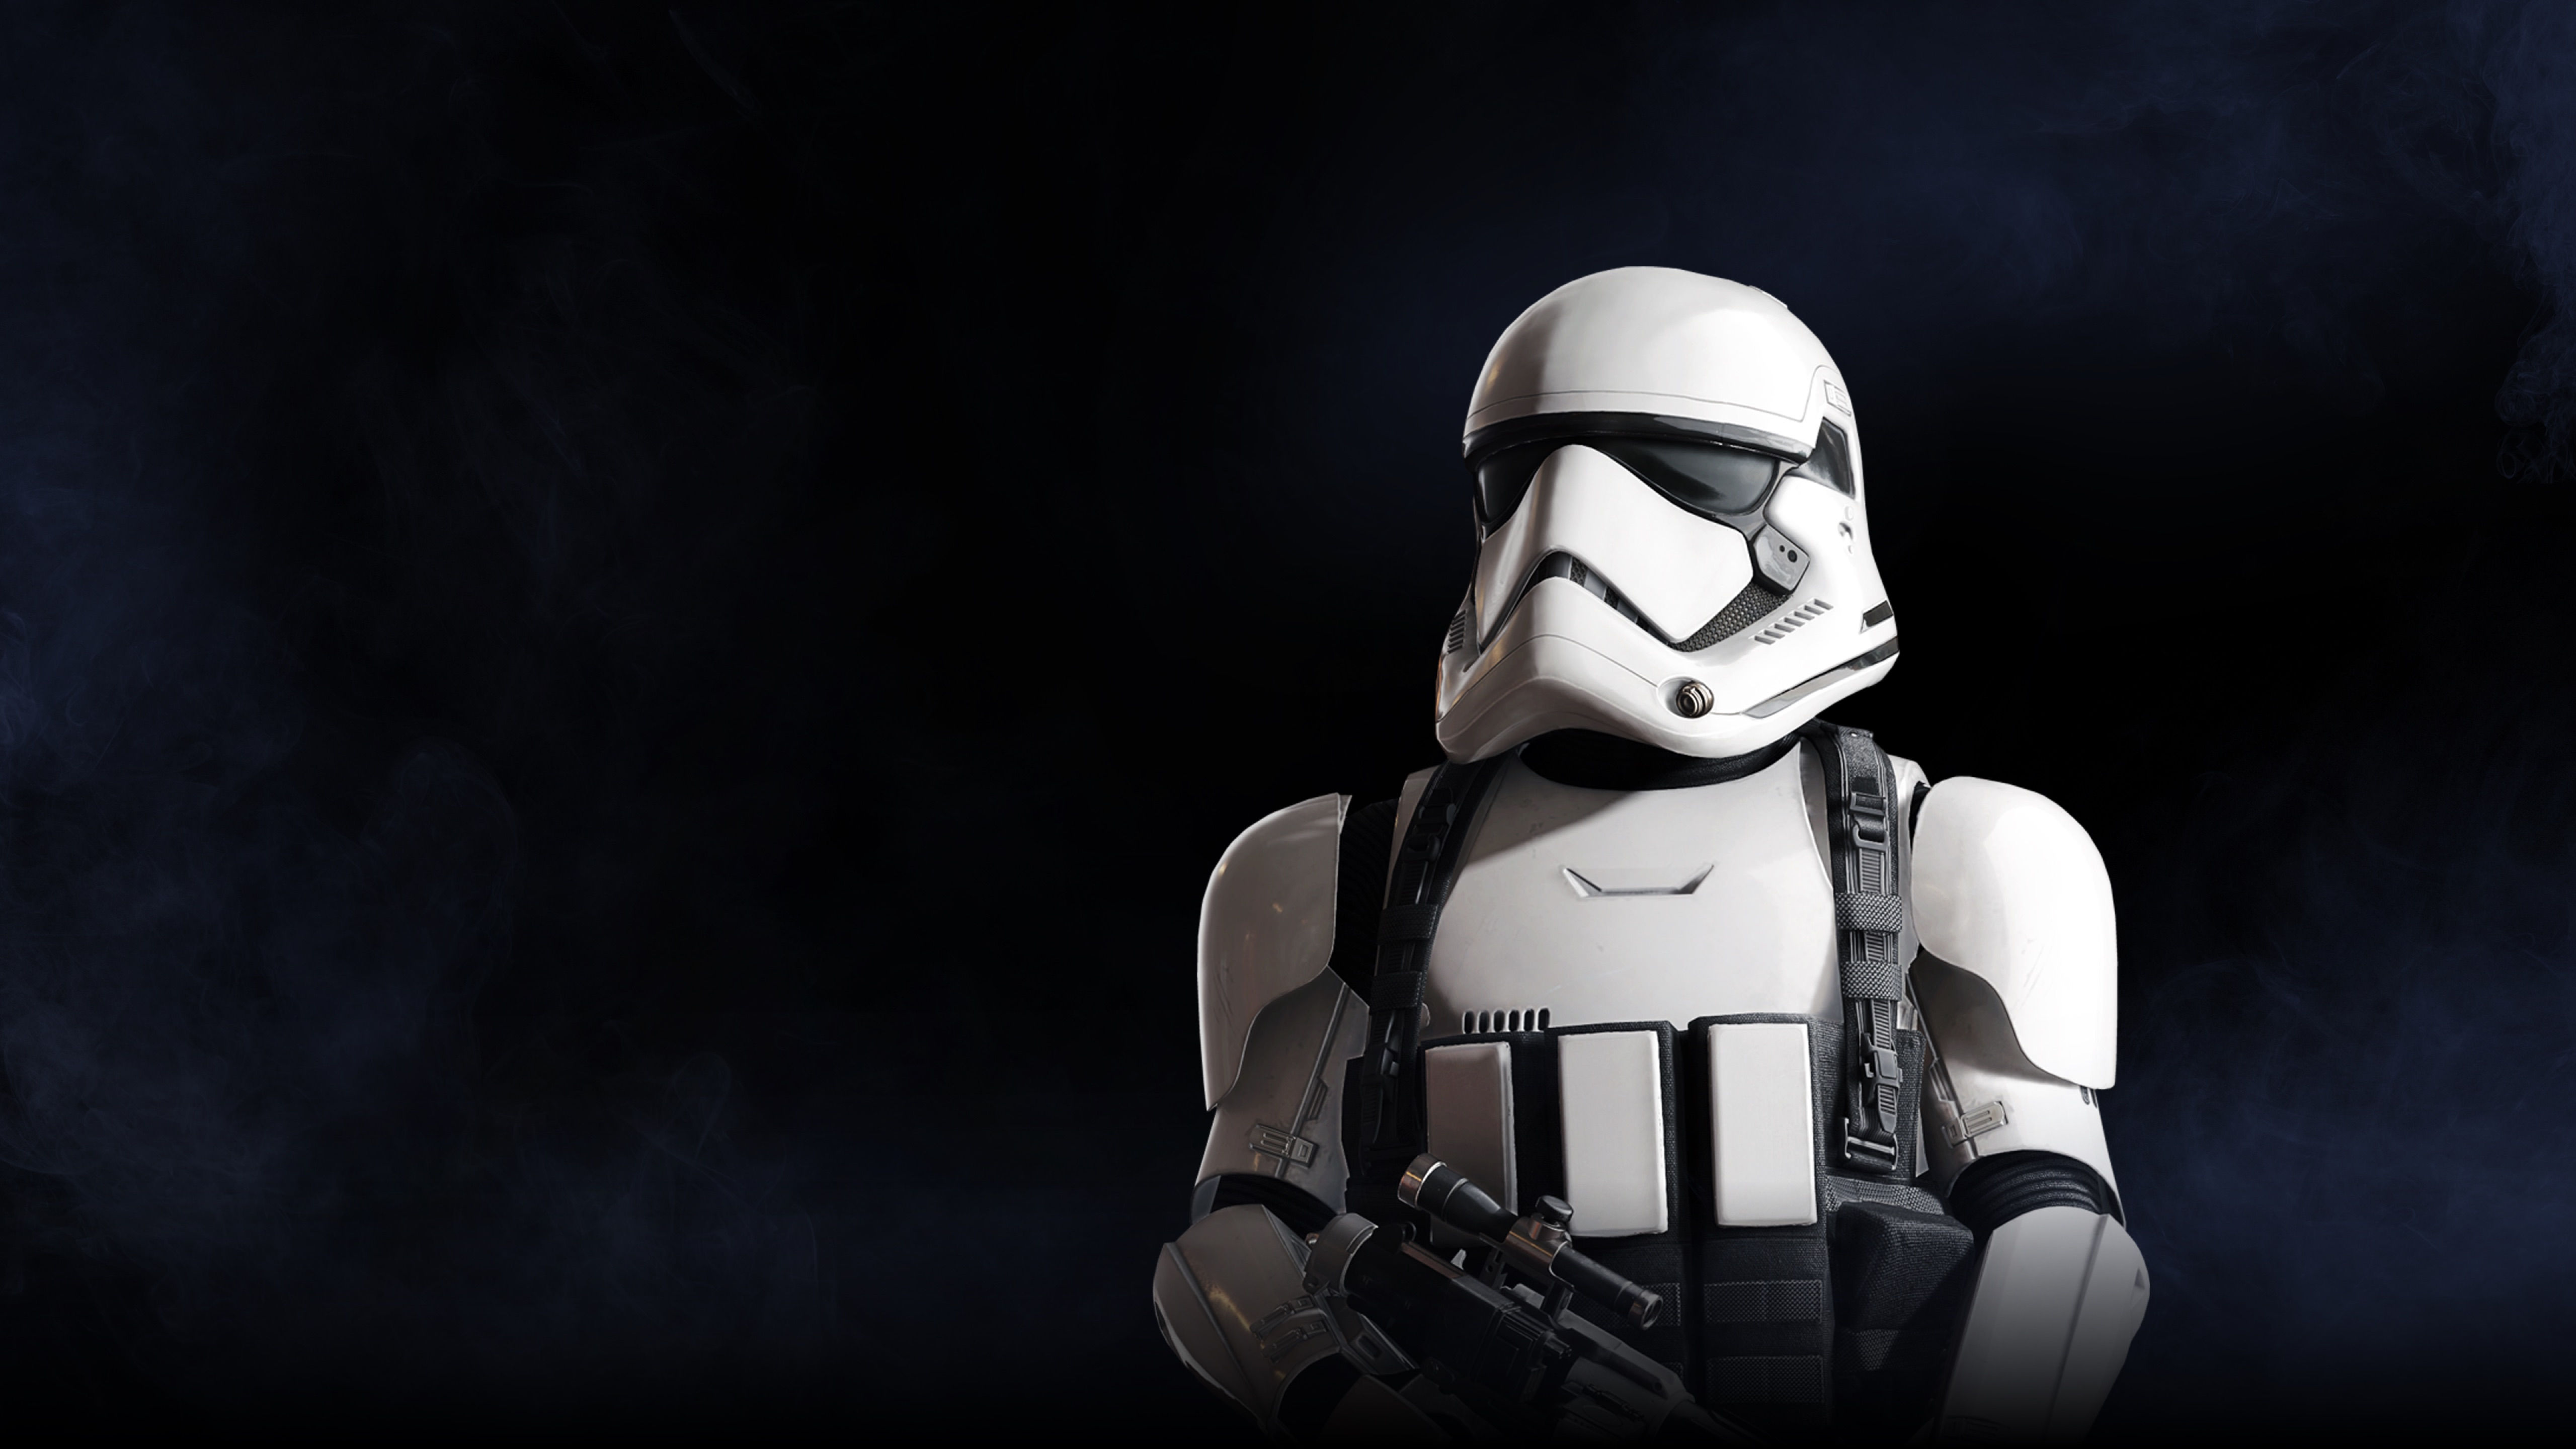 stormtrooper star wars battlefront 2 5k sz